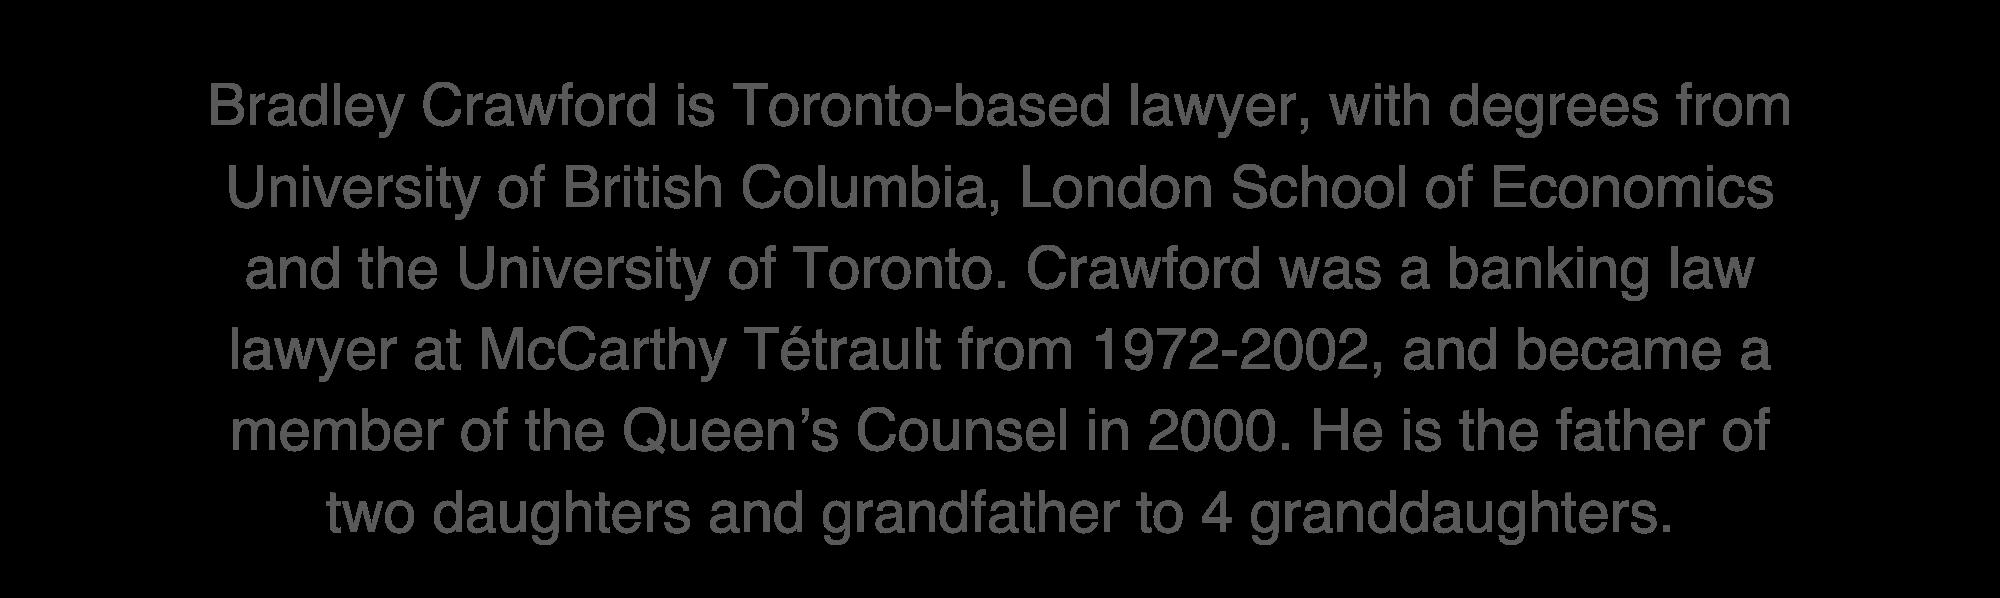 Bradley crawford Biography